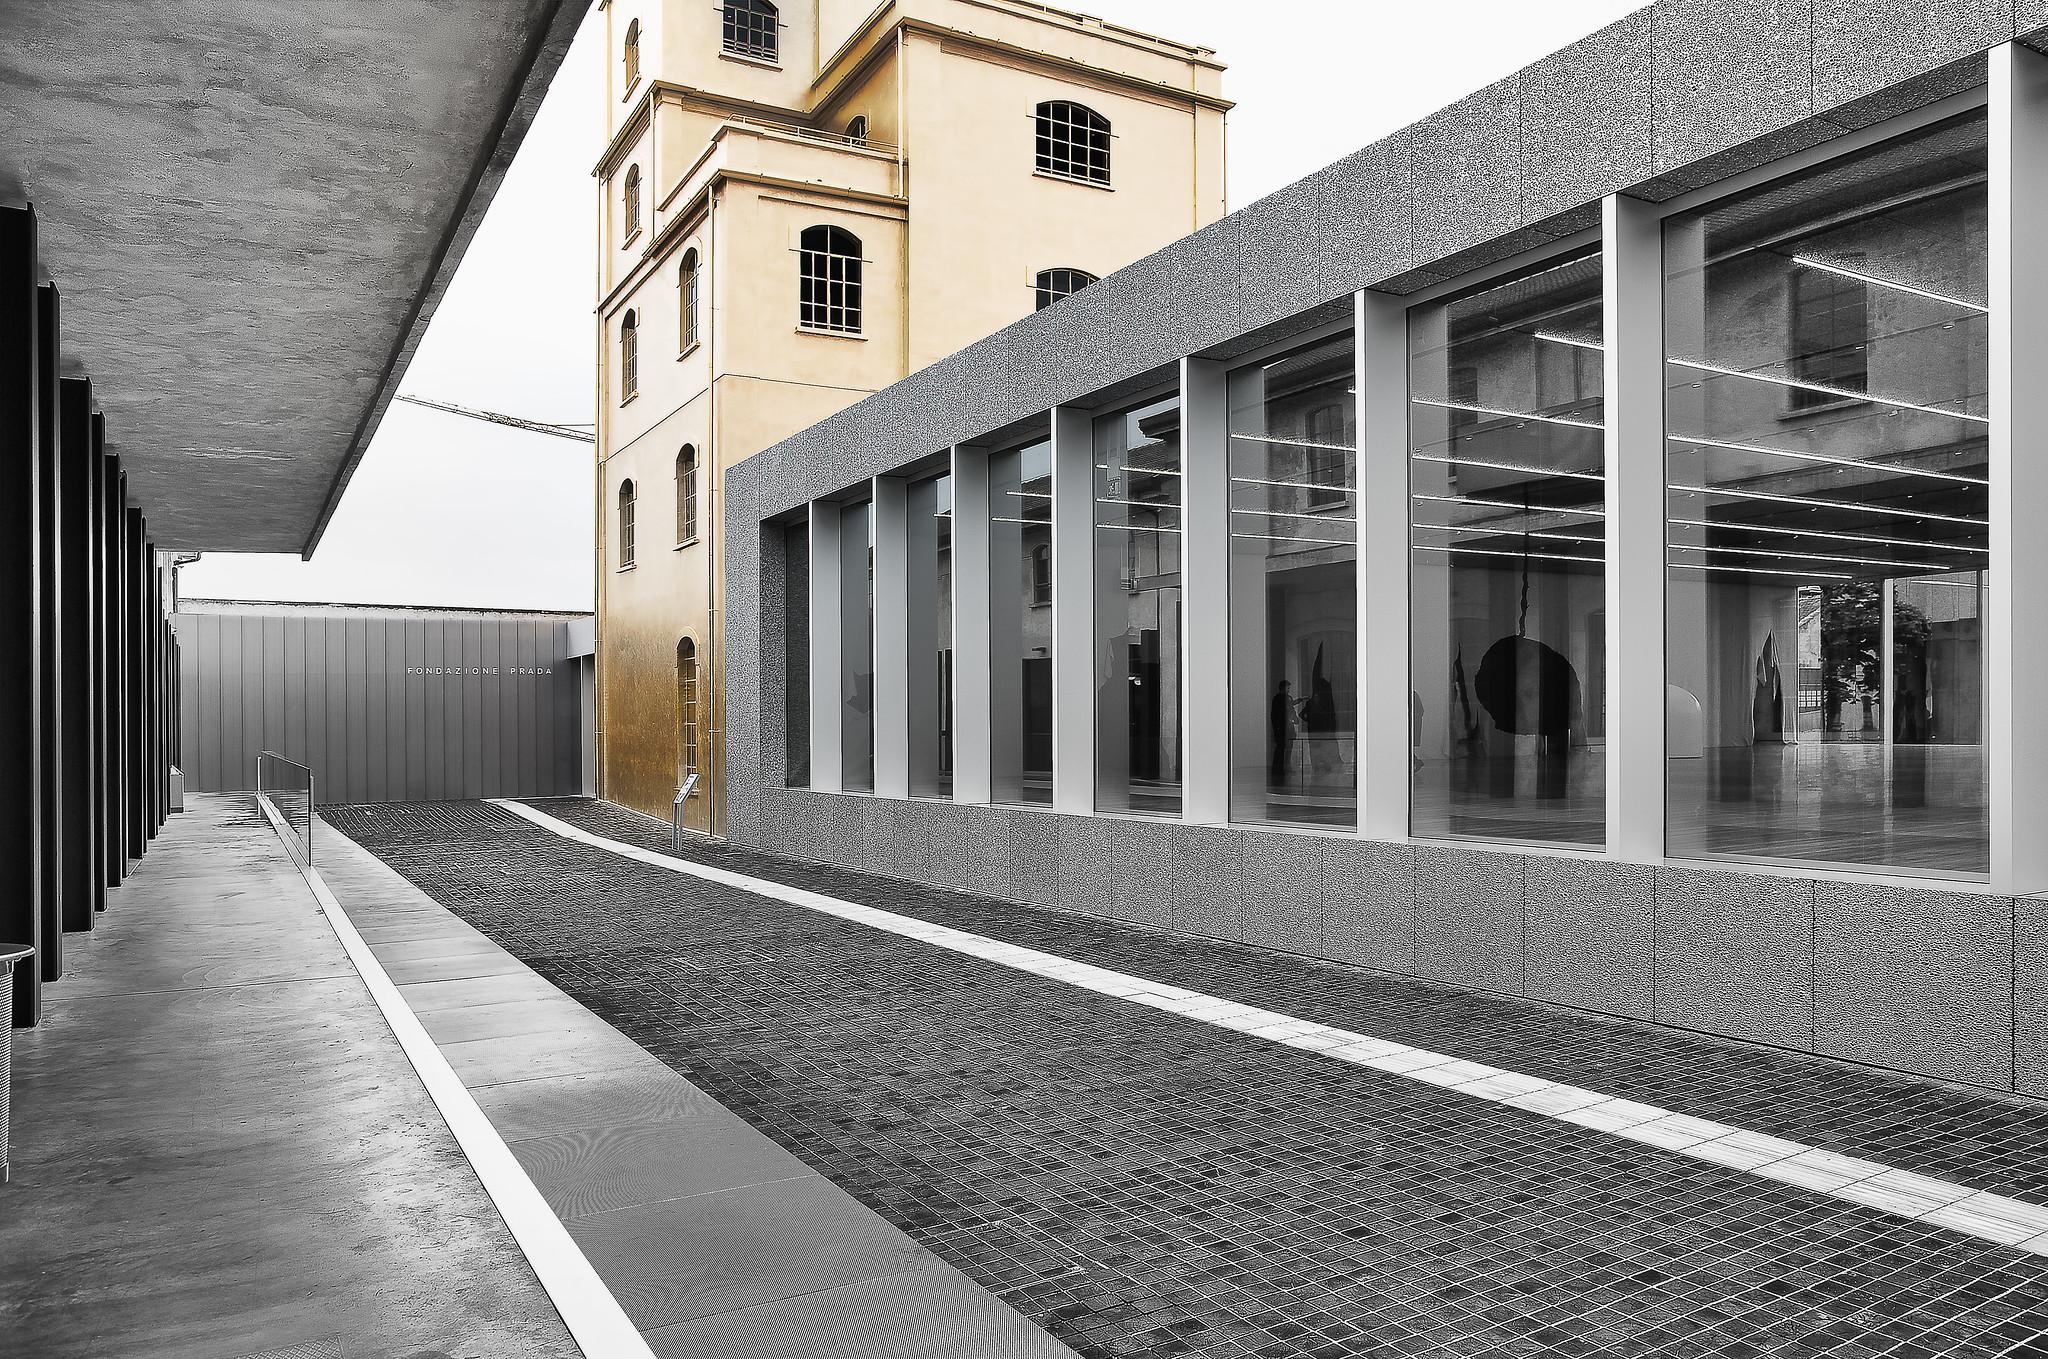 Fondazione Prada, Milan